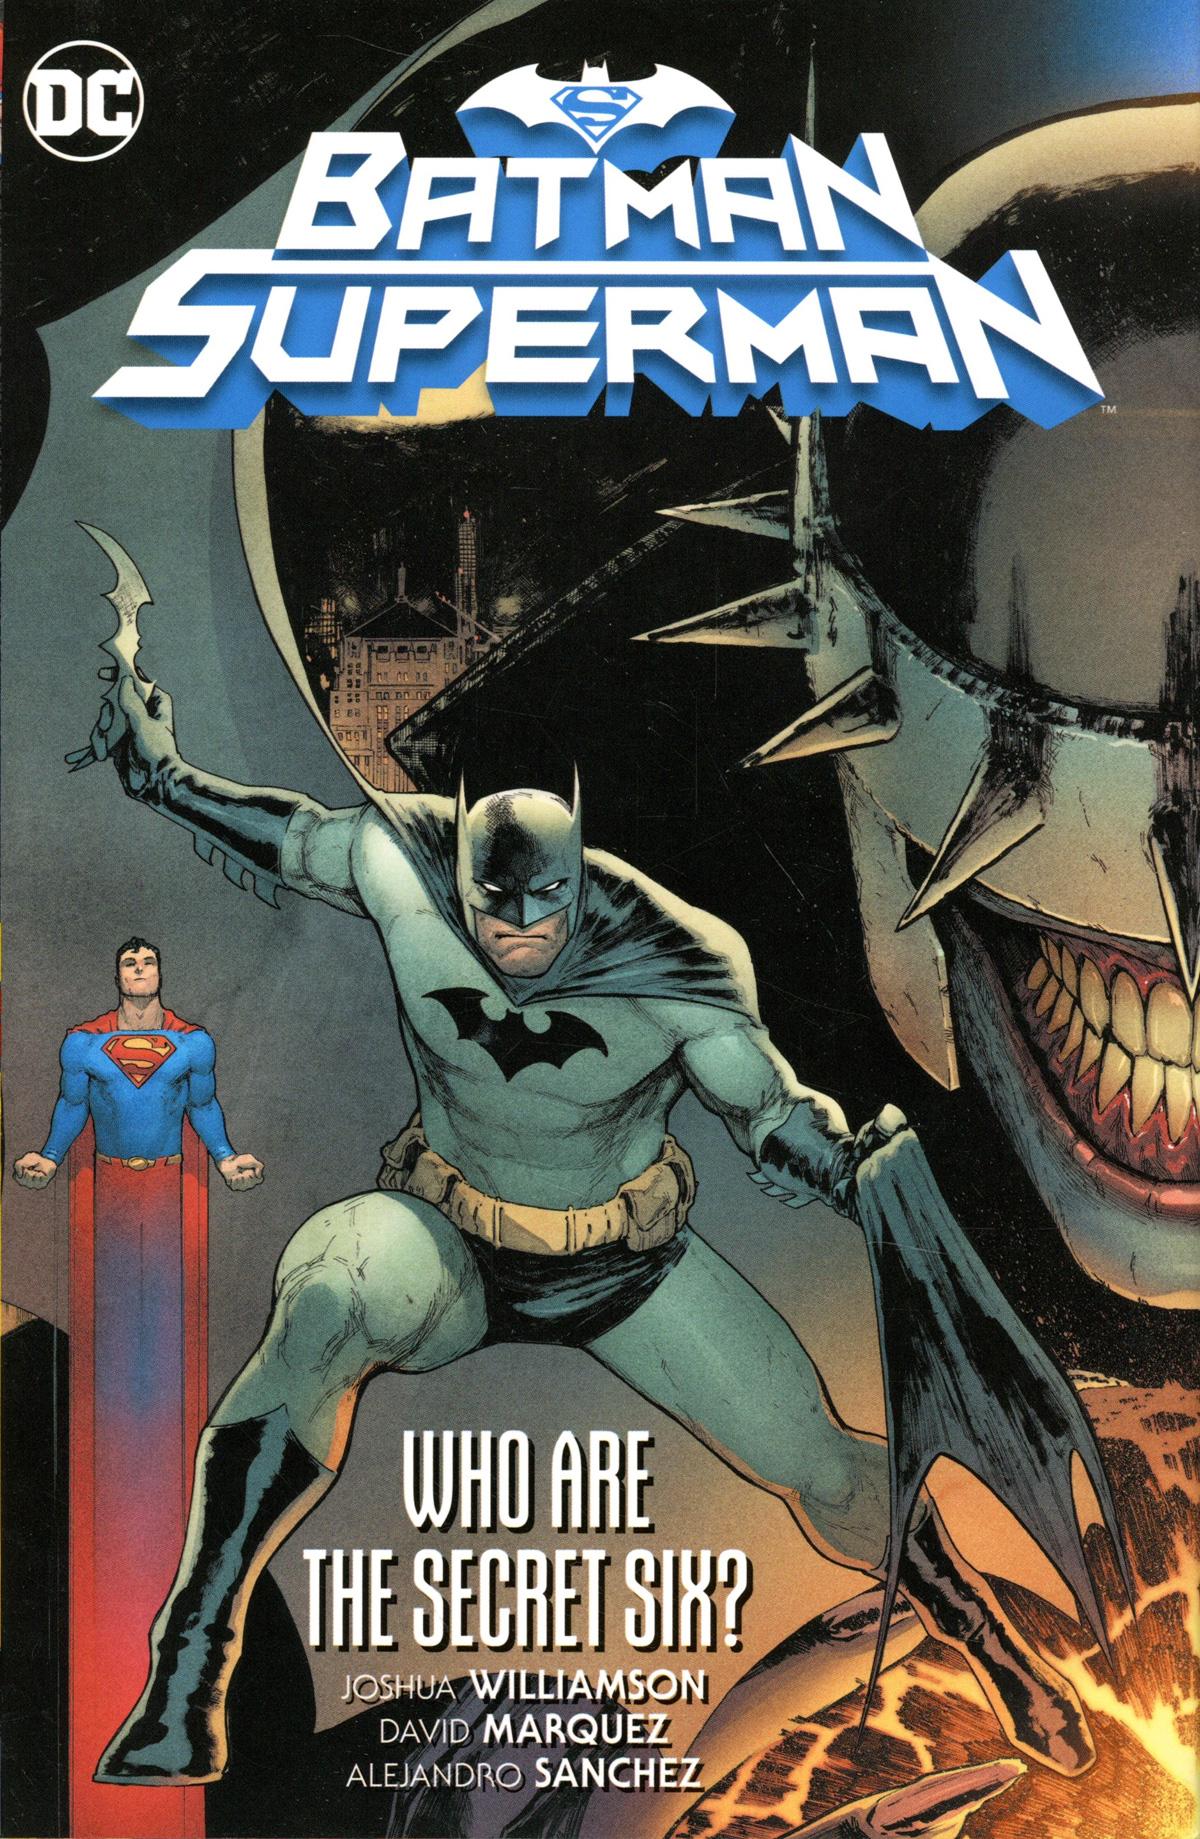 Batman Superman (2019) Vol 1 Who Are The Secret Six HC